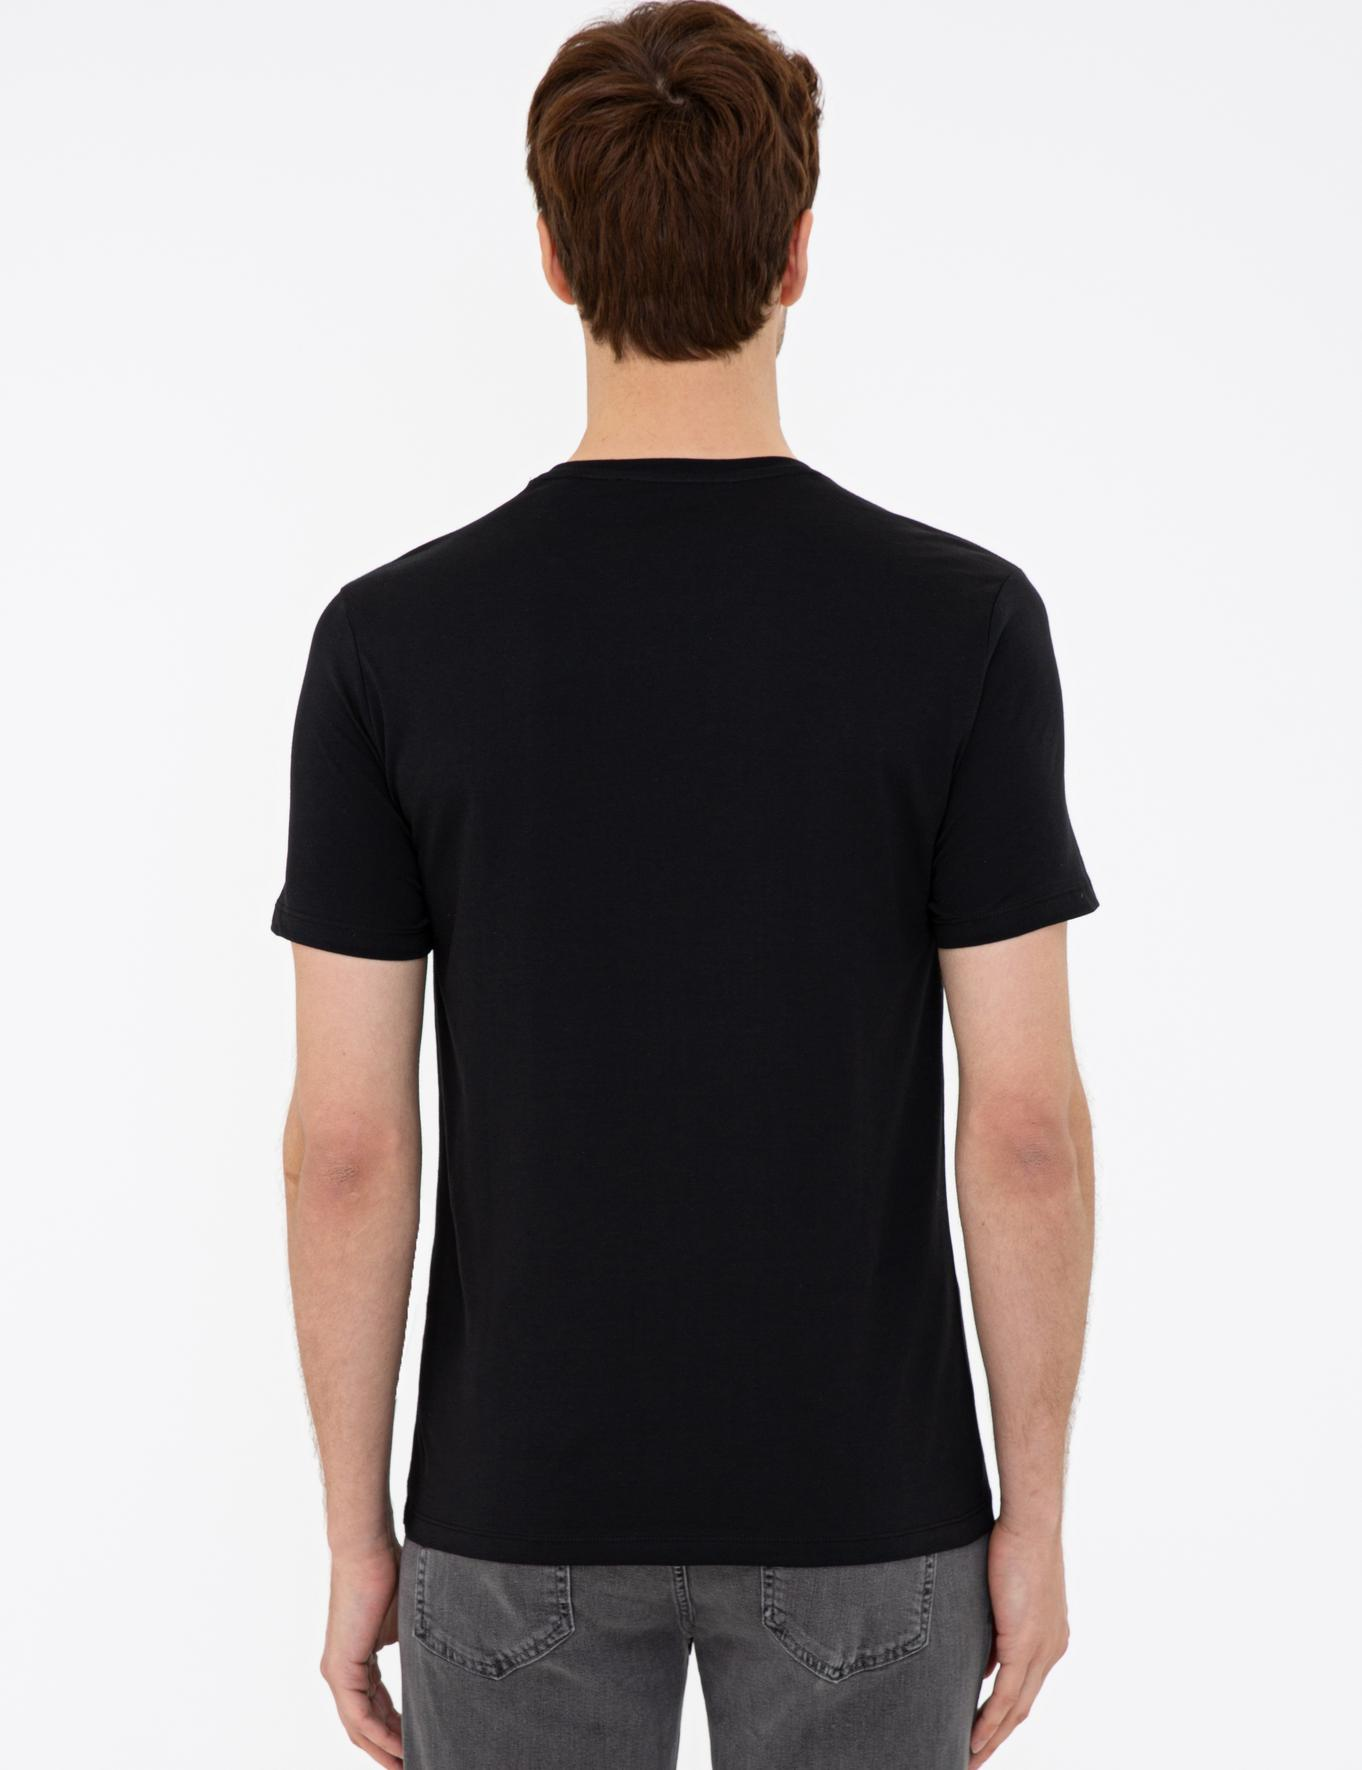 Bisiklet Yaka Basic T-Shirt - 50239832036